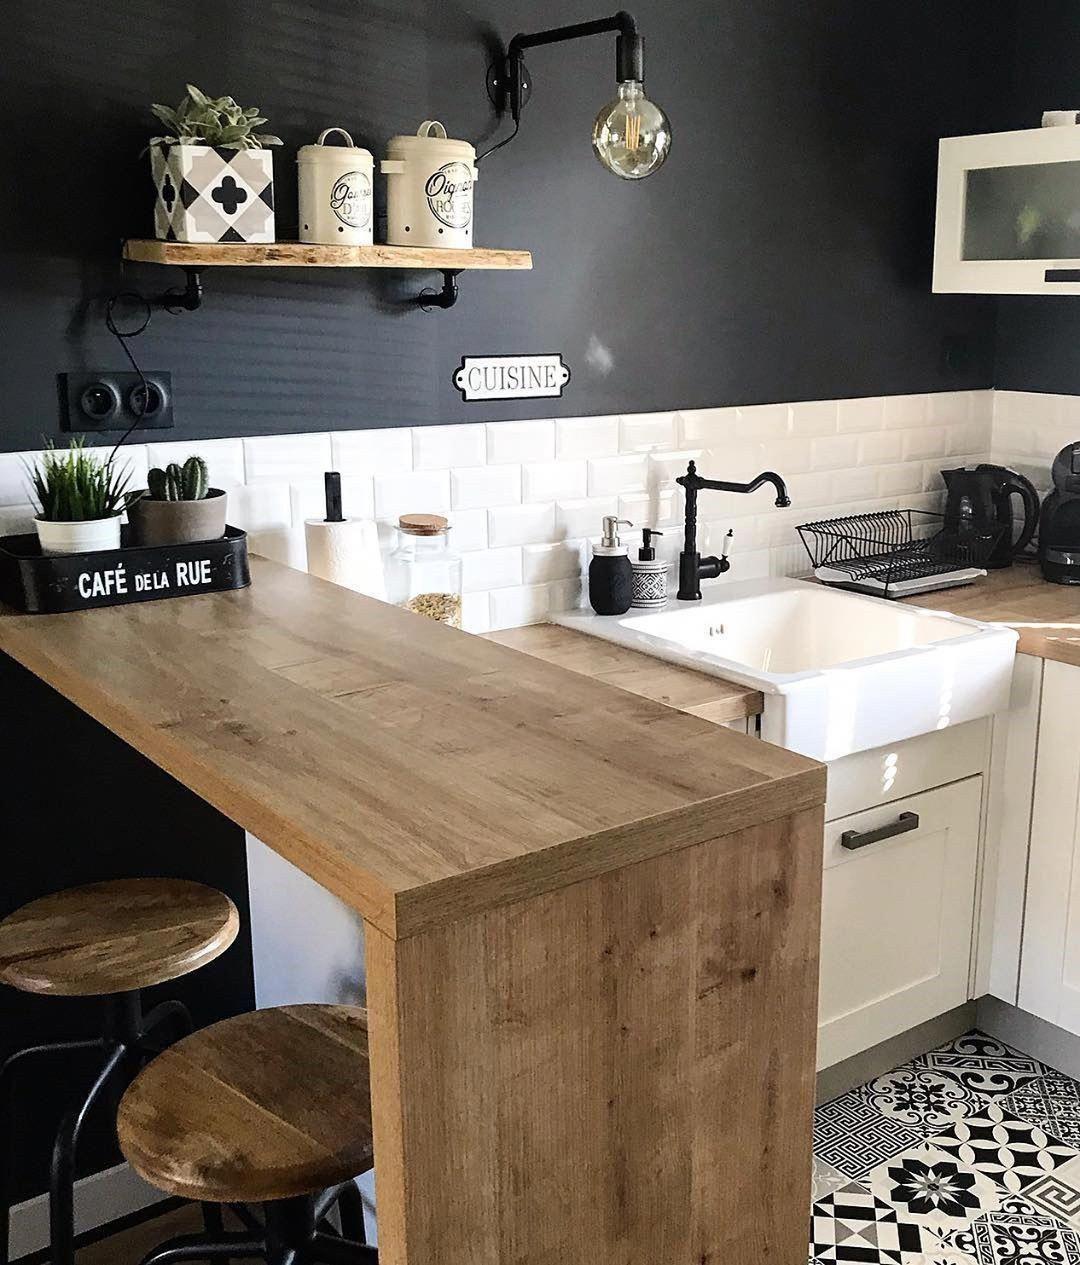 60 Small Kitchen Design Ideas To Make Your Home More Awesome Kitchendesigns Kitchendesignide Kitchen Design Small Kitchen Remodel Small Home Decor Kitchen